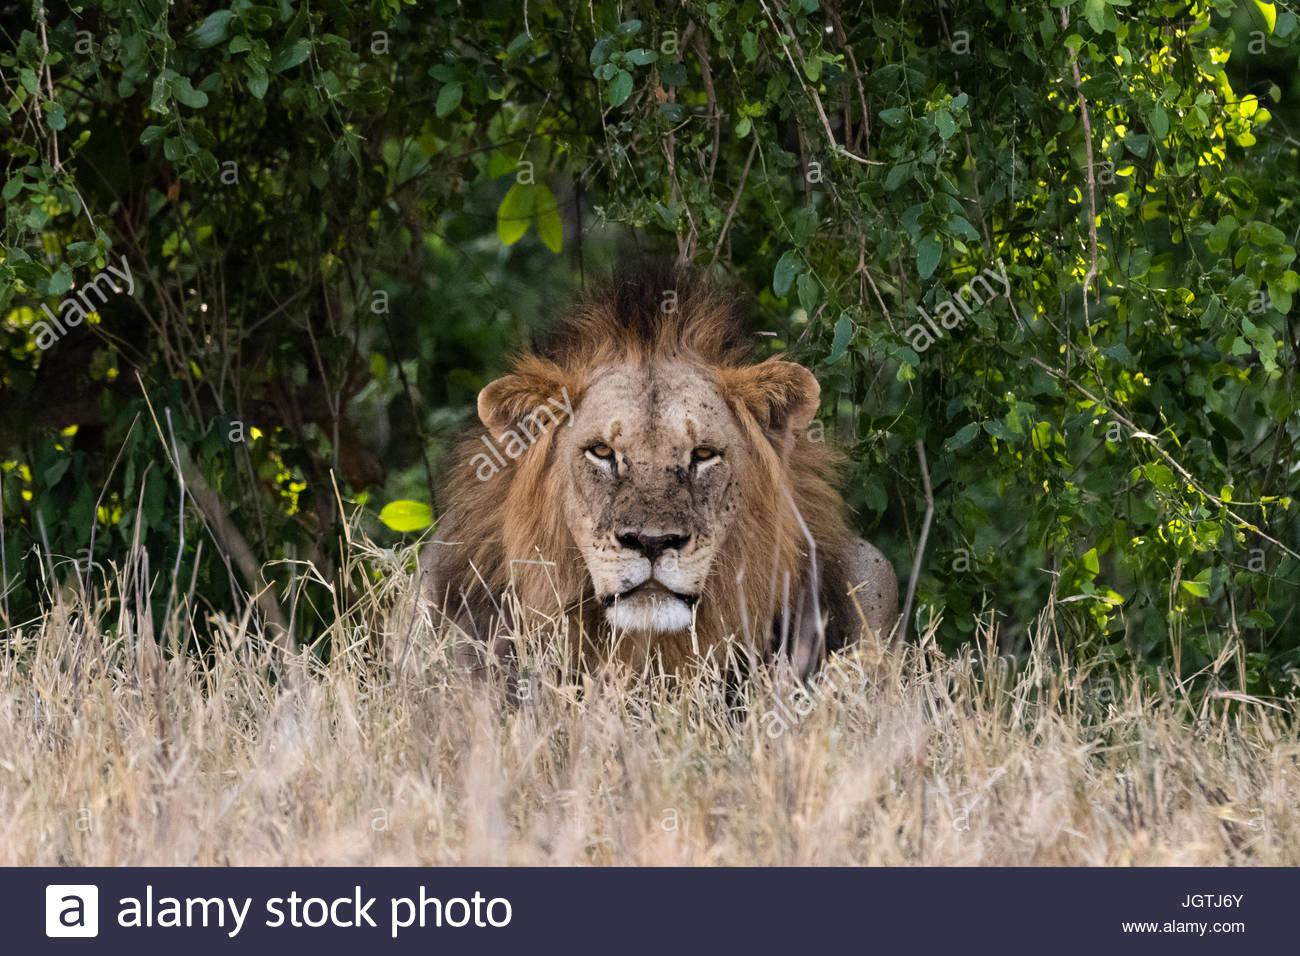 Un adulto totalmente crecido, león Panthera leo, mirando a la cámara. Imagen De Stock